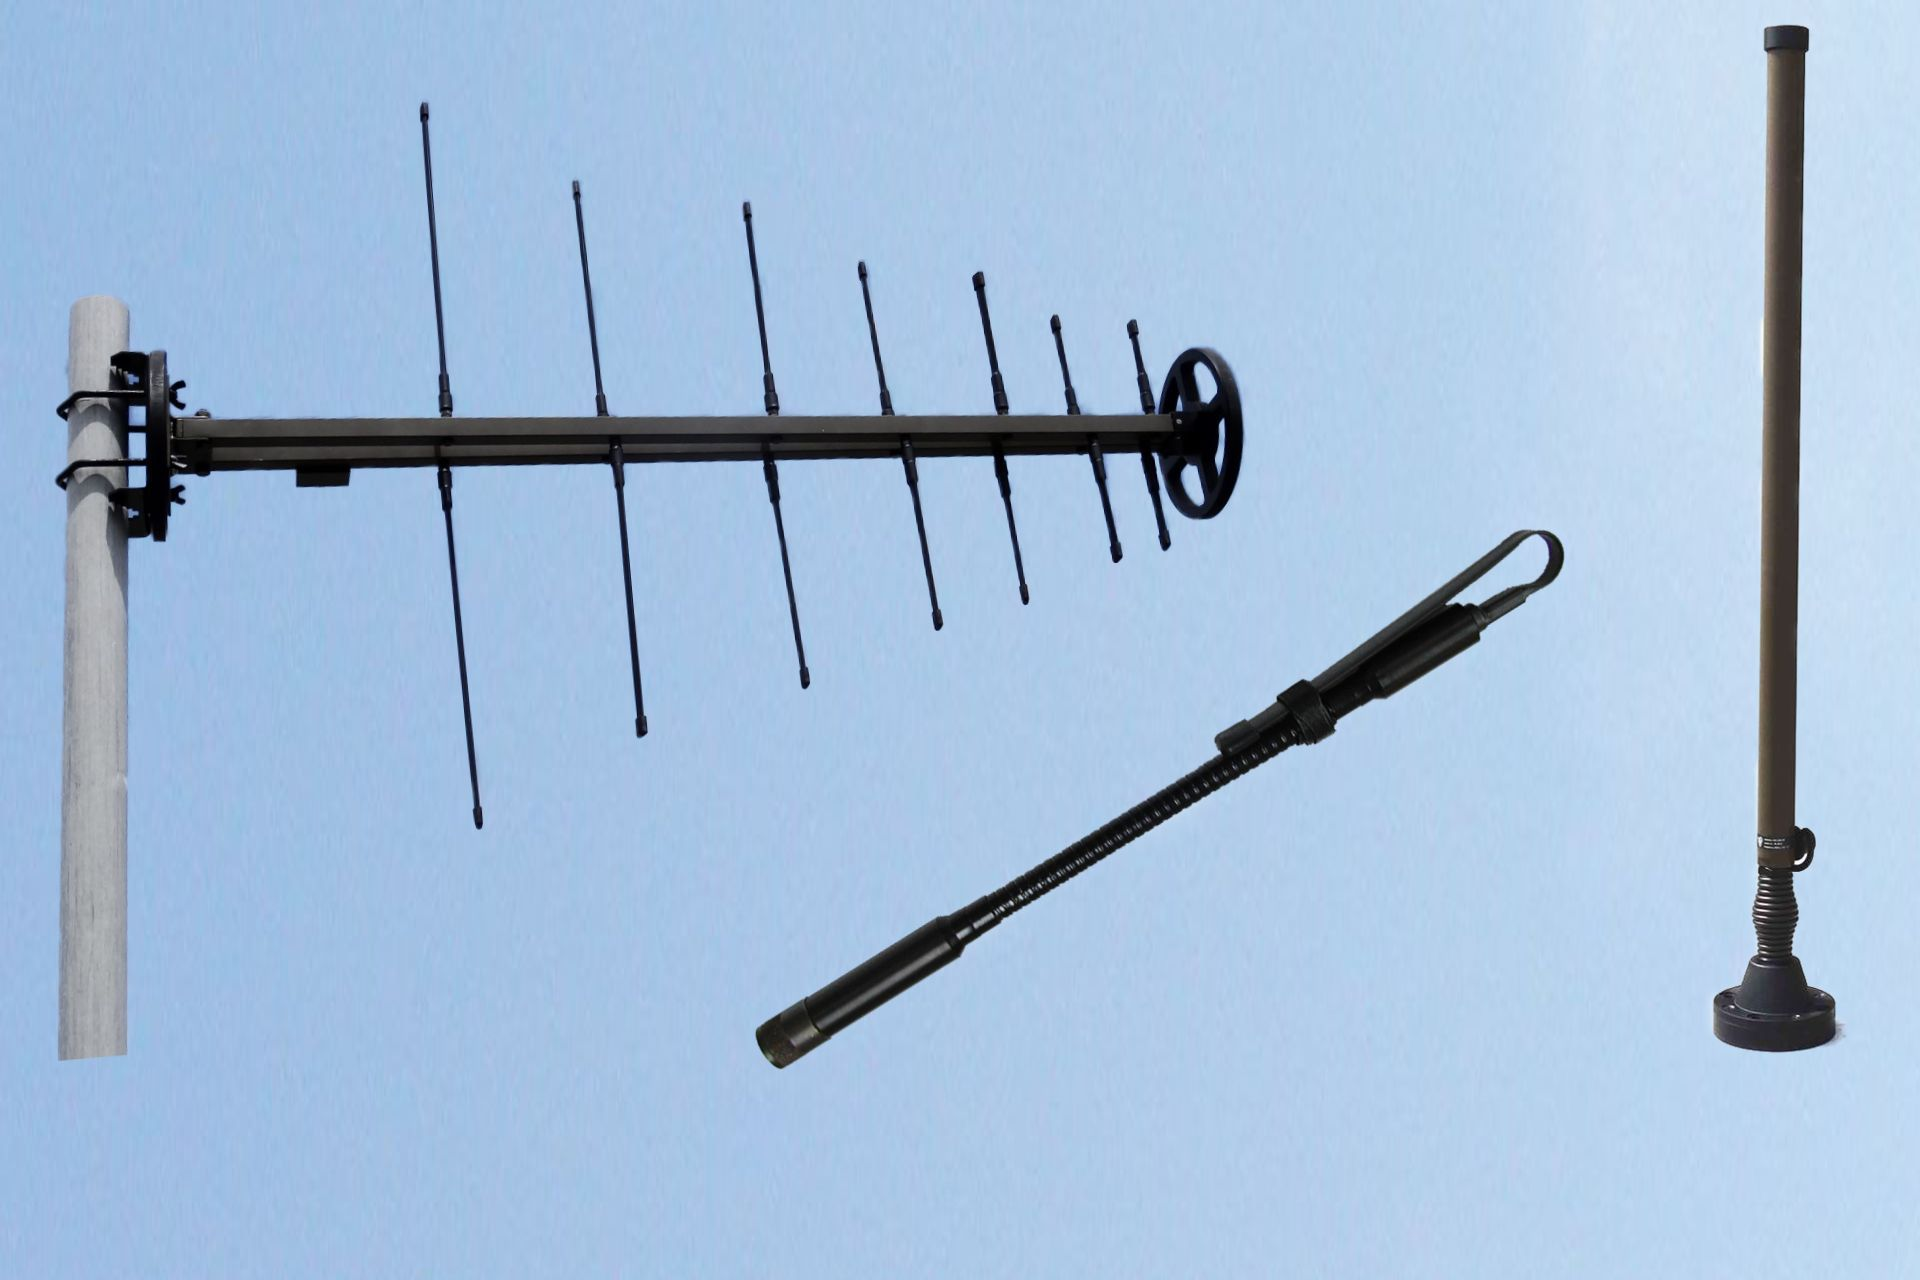 UHF ANTENNAS 225 - 512 MHz